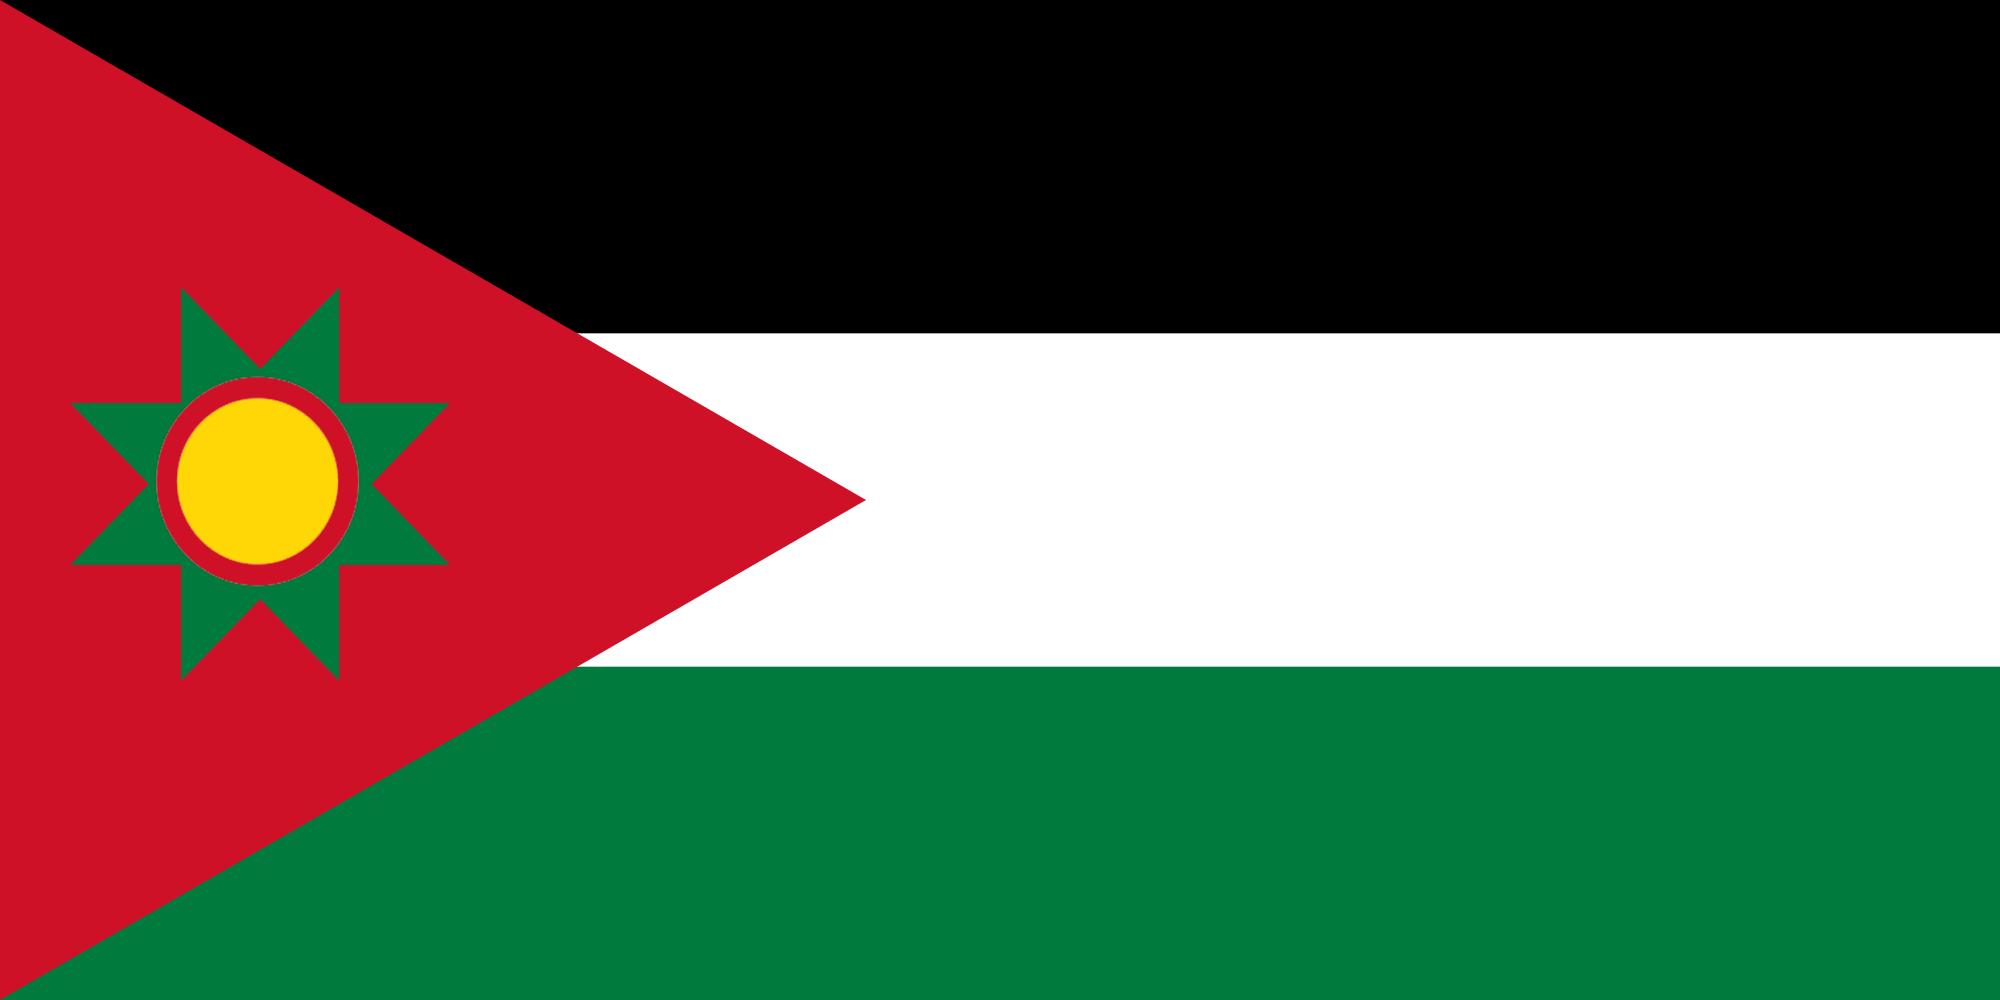 The Flag of the al-Jumhuriat al-Ahmadi al-Sahil (Solentia)